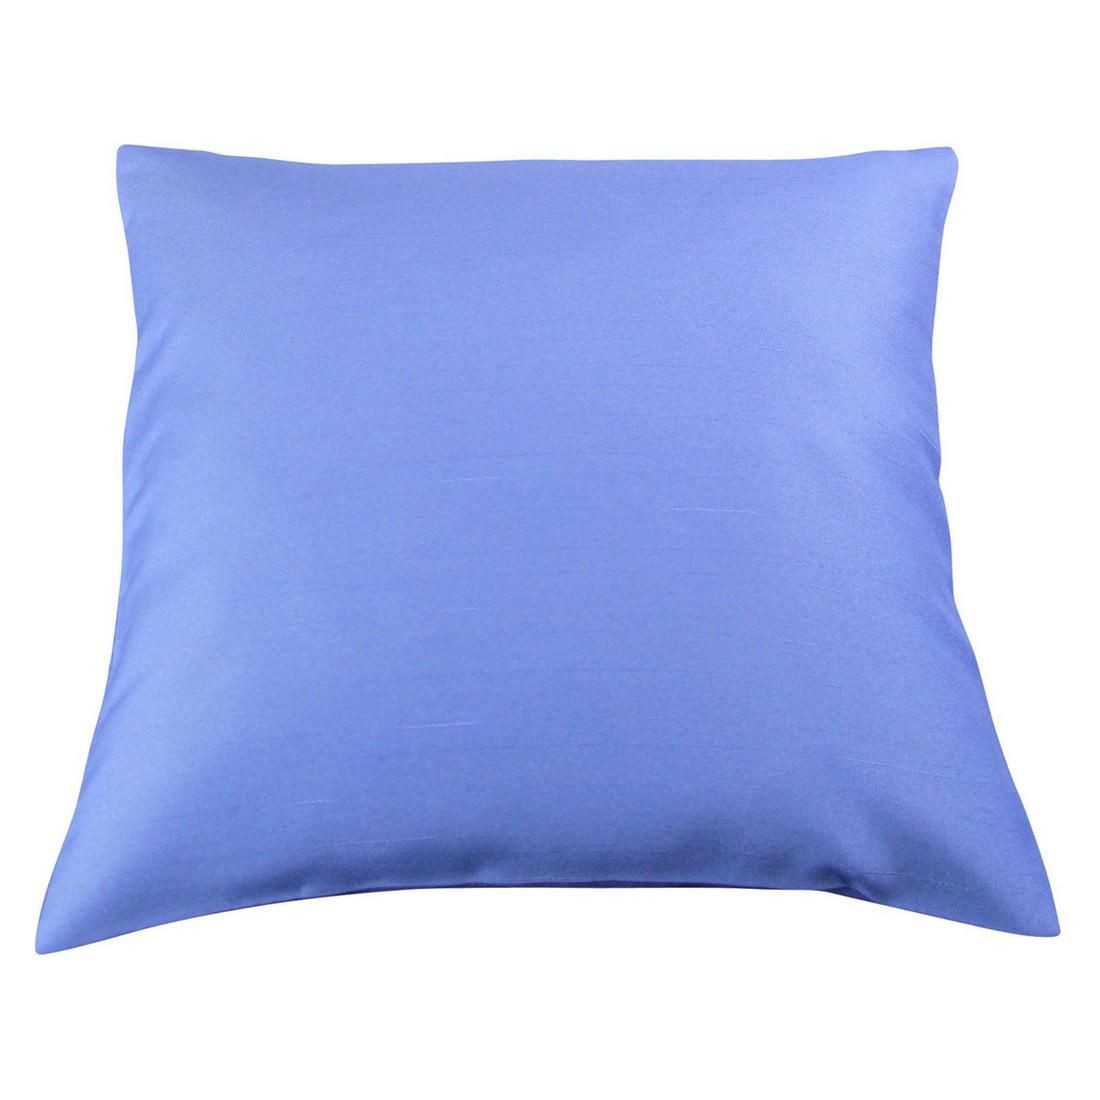 Kissenhülle Nova (2er,4er oder 6er-Set) – Blau – 50 x 50 cm – 6 Kissen, MiBiento Living günstig